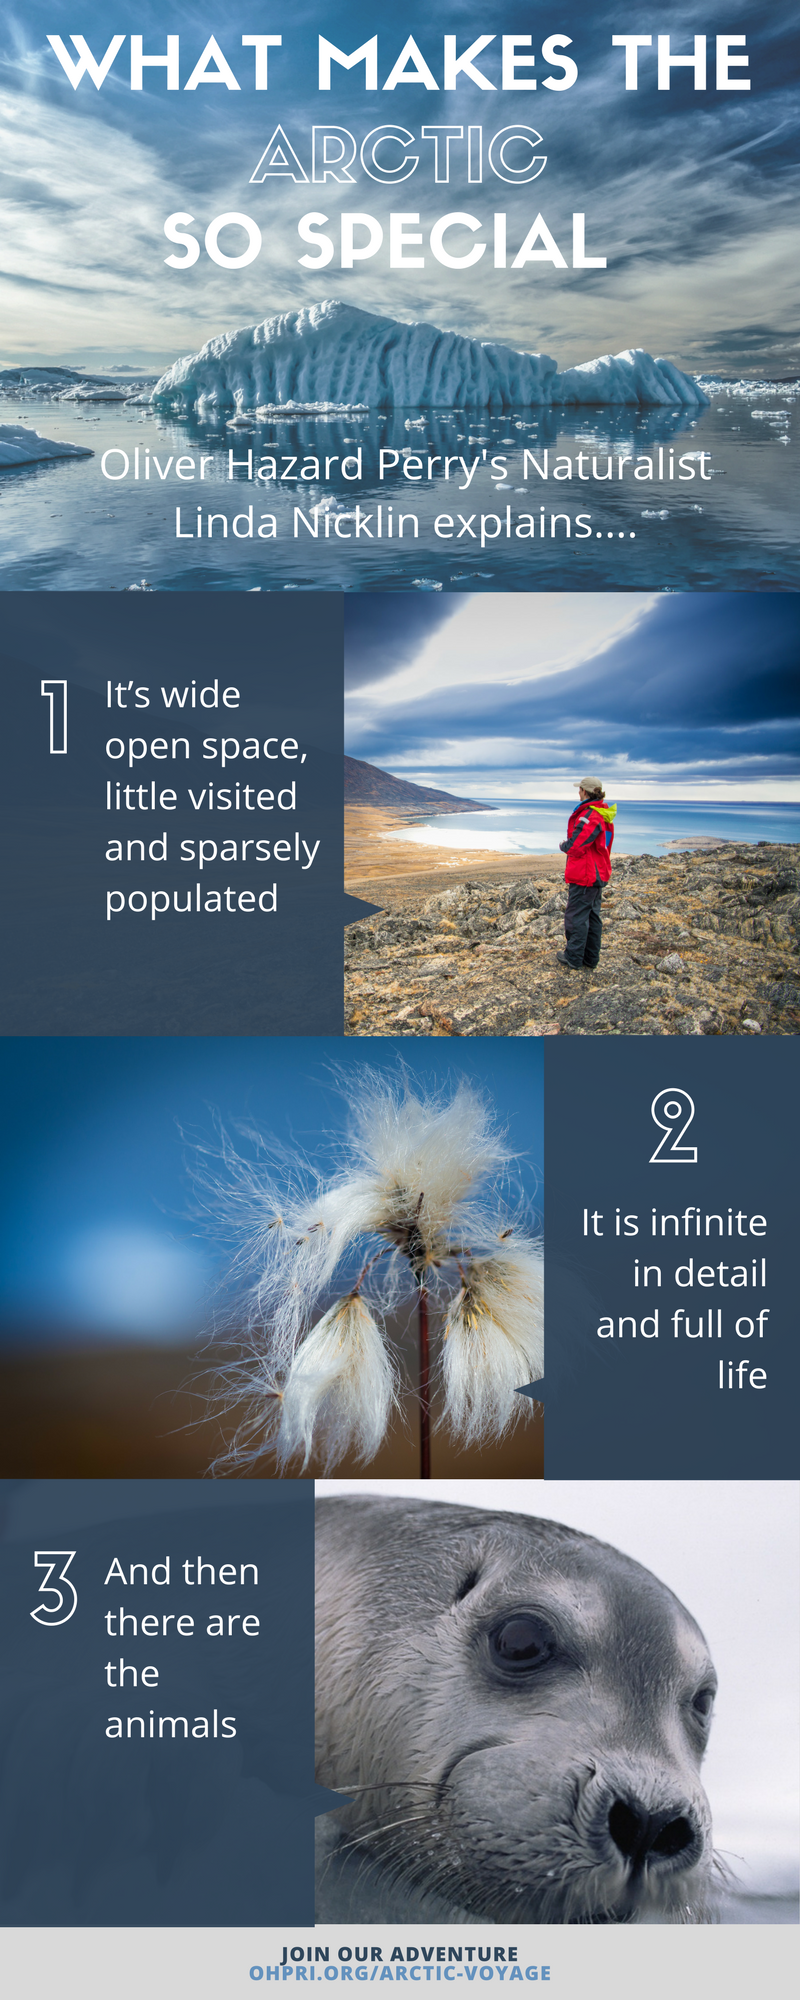 Photo credits: Vancouver Maritime Museum (top 3) & Flip Nicklin/Minden Pictures (bottom).